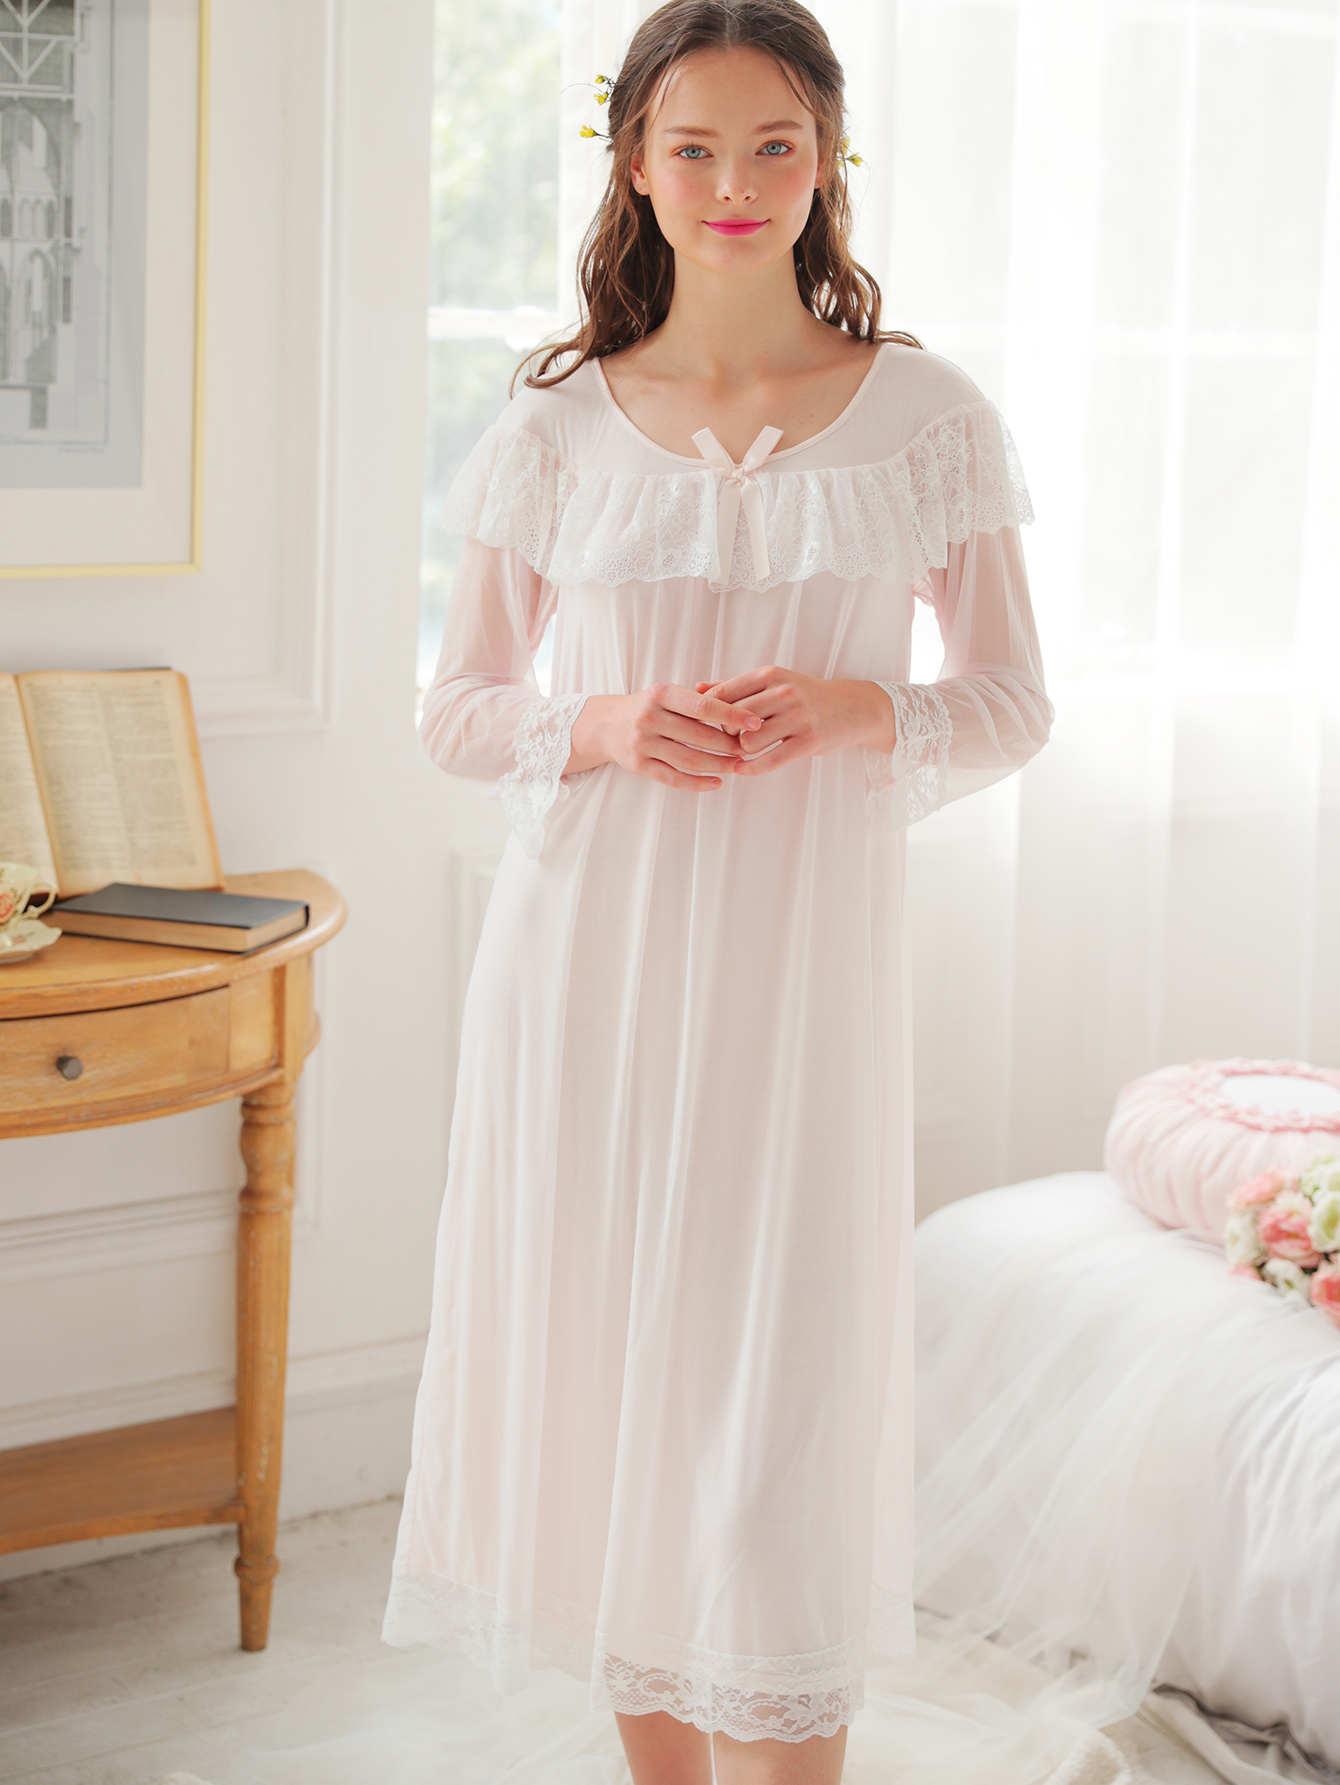 Contrast Lace Pleated Night Dress contrast mesh box pleated plain dress